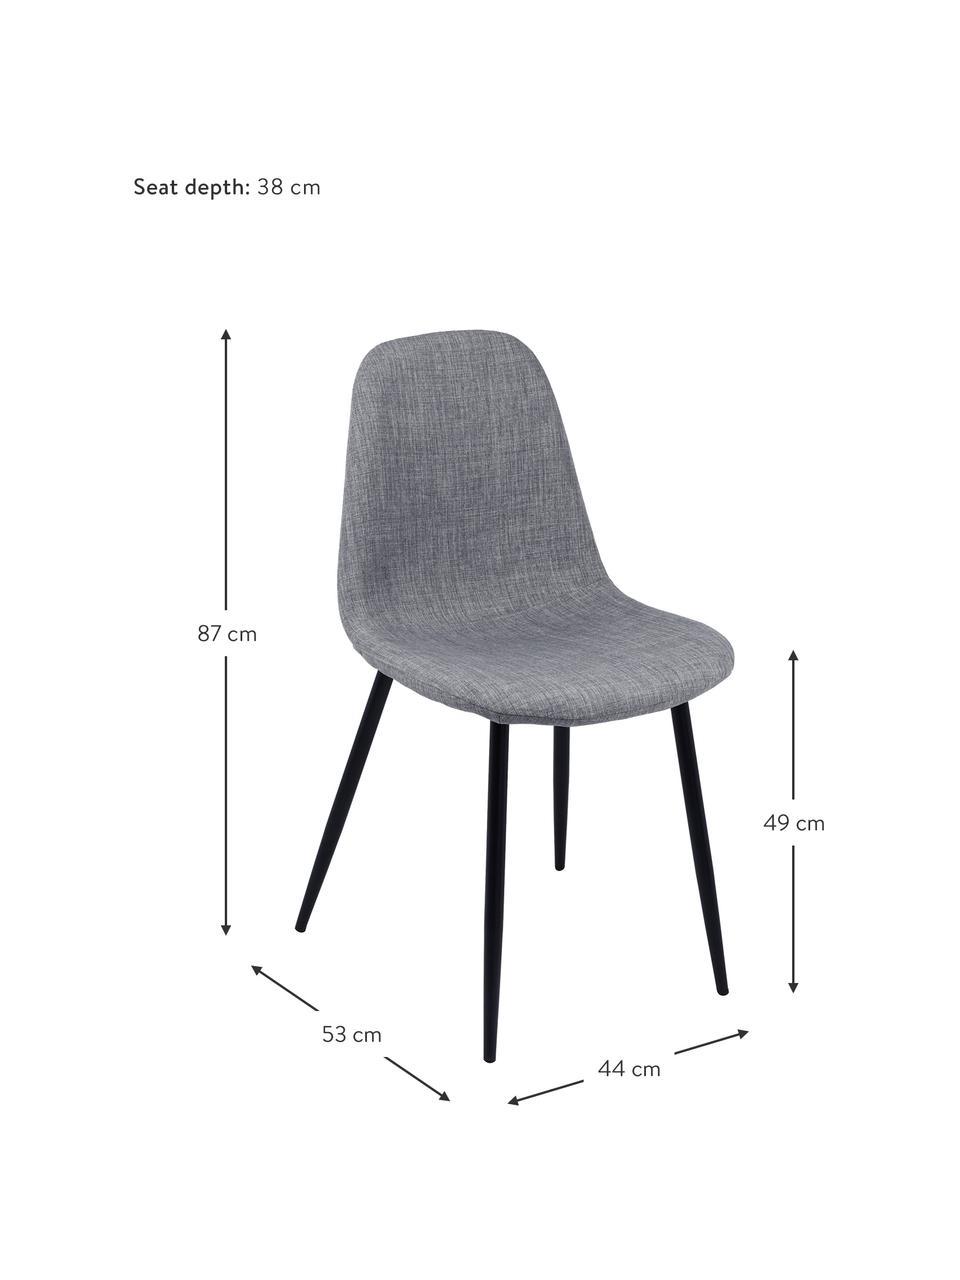 Sedia imbottita in tessuto grigio Karla 2 pz, Rivestimento: 100% poliestere, Piedini: metallo, Tessuto grigio chiaro, Larg. 44 x Prof. 53 cm